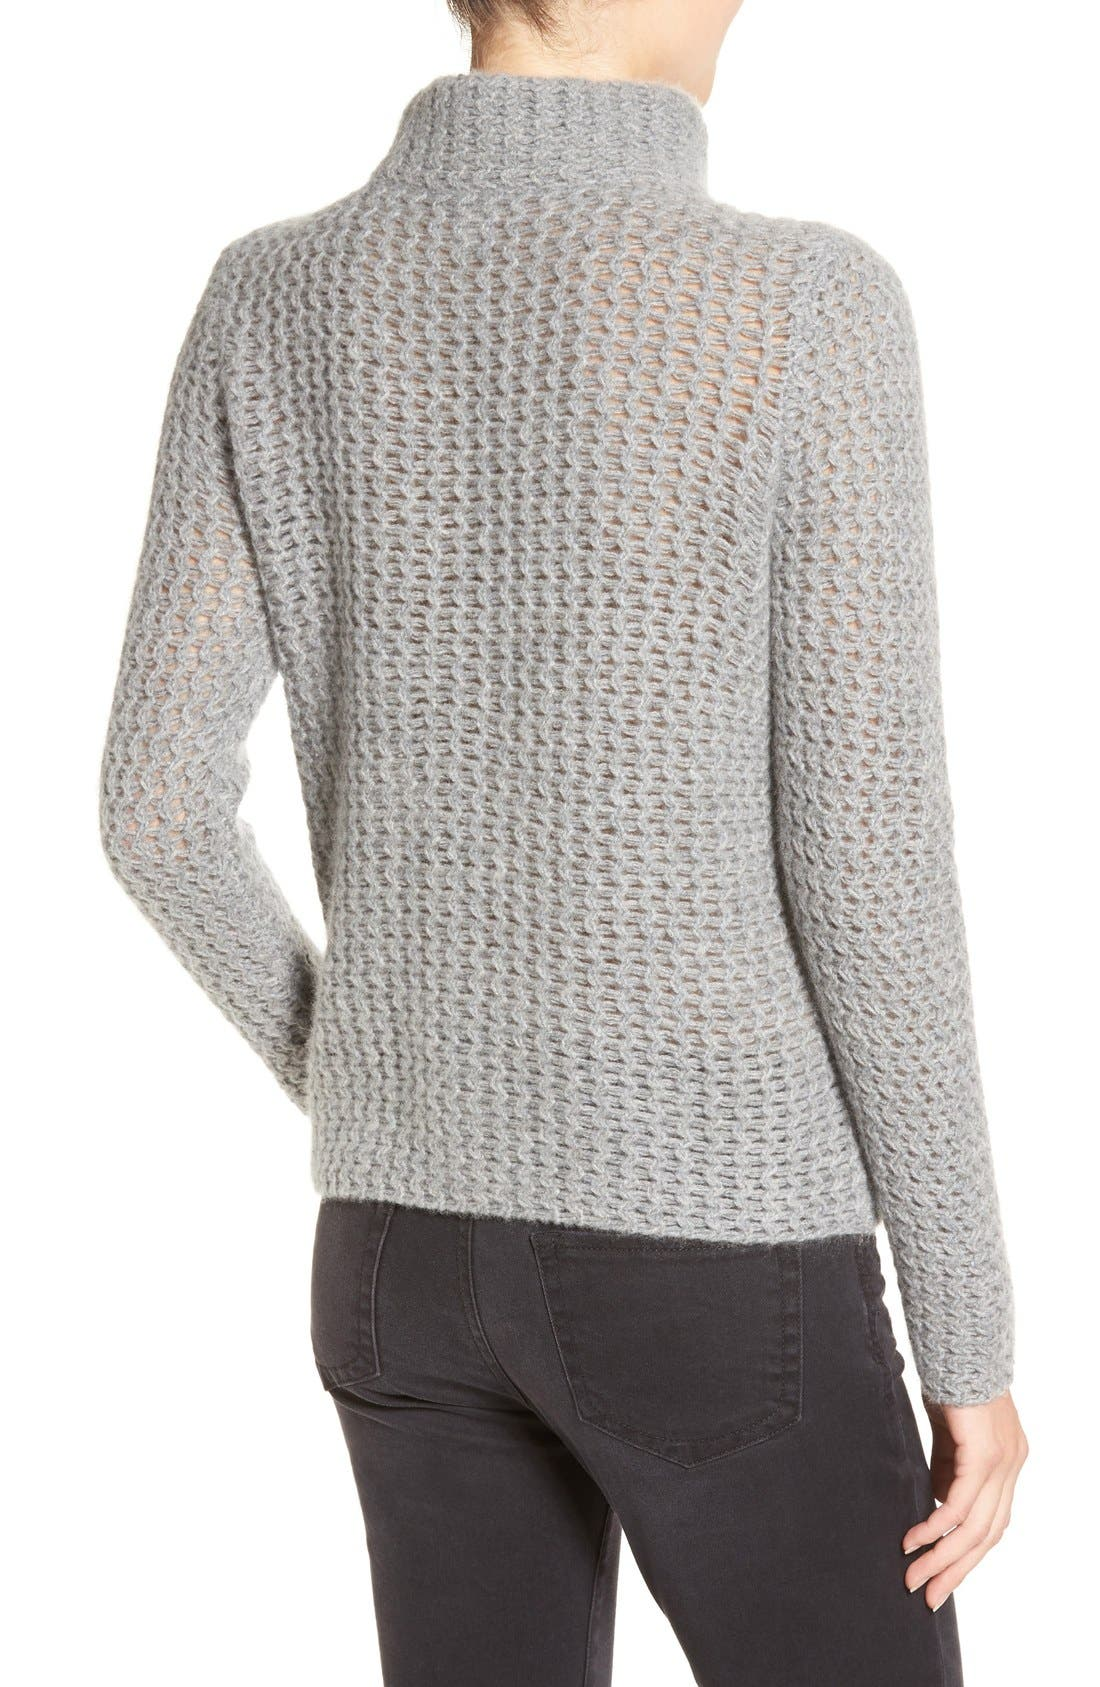 Alternate Image 3  - Halogen® Stitch Detail Cashmere Mock Neck Sweater (Regular & Petite)